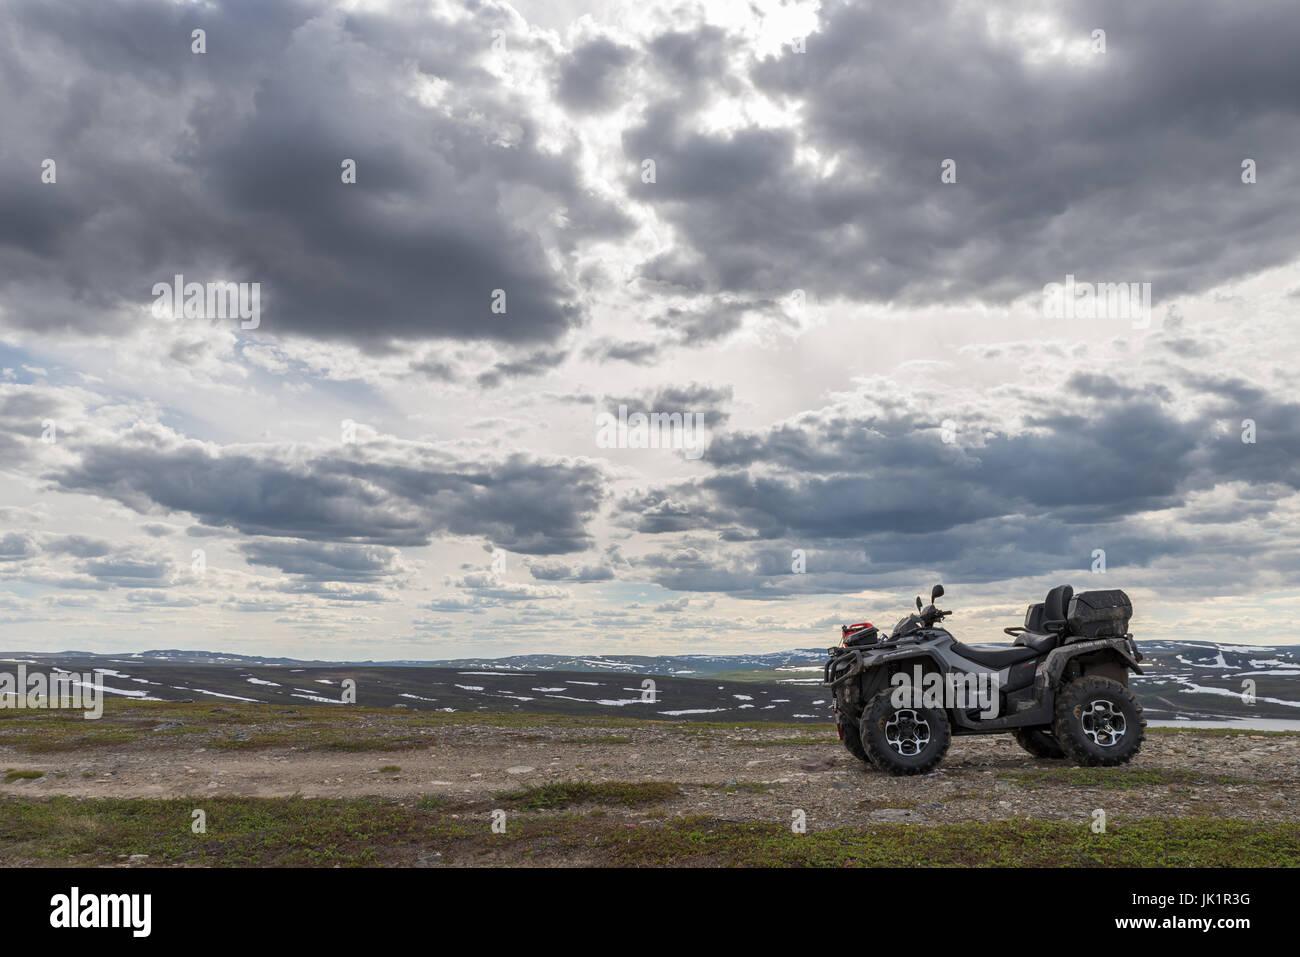 atv exploring mountain arctic Finnmark Norway - Stock Image